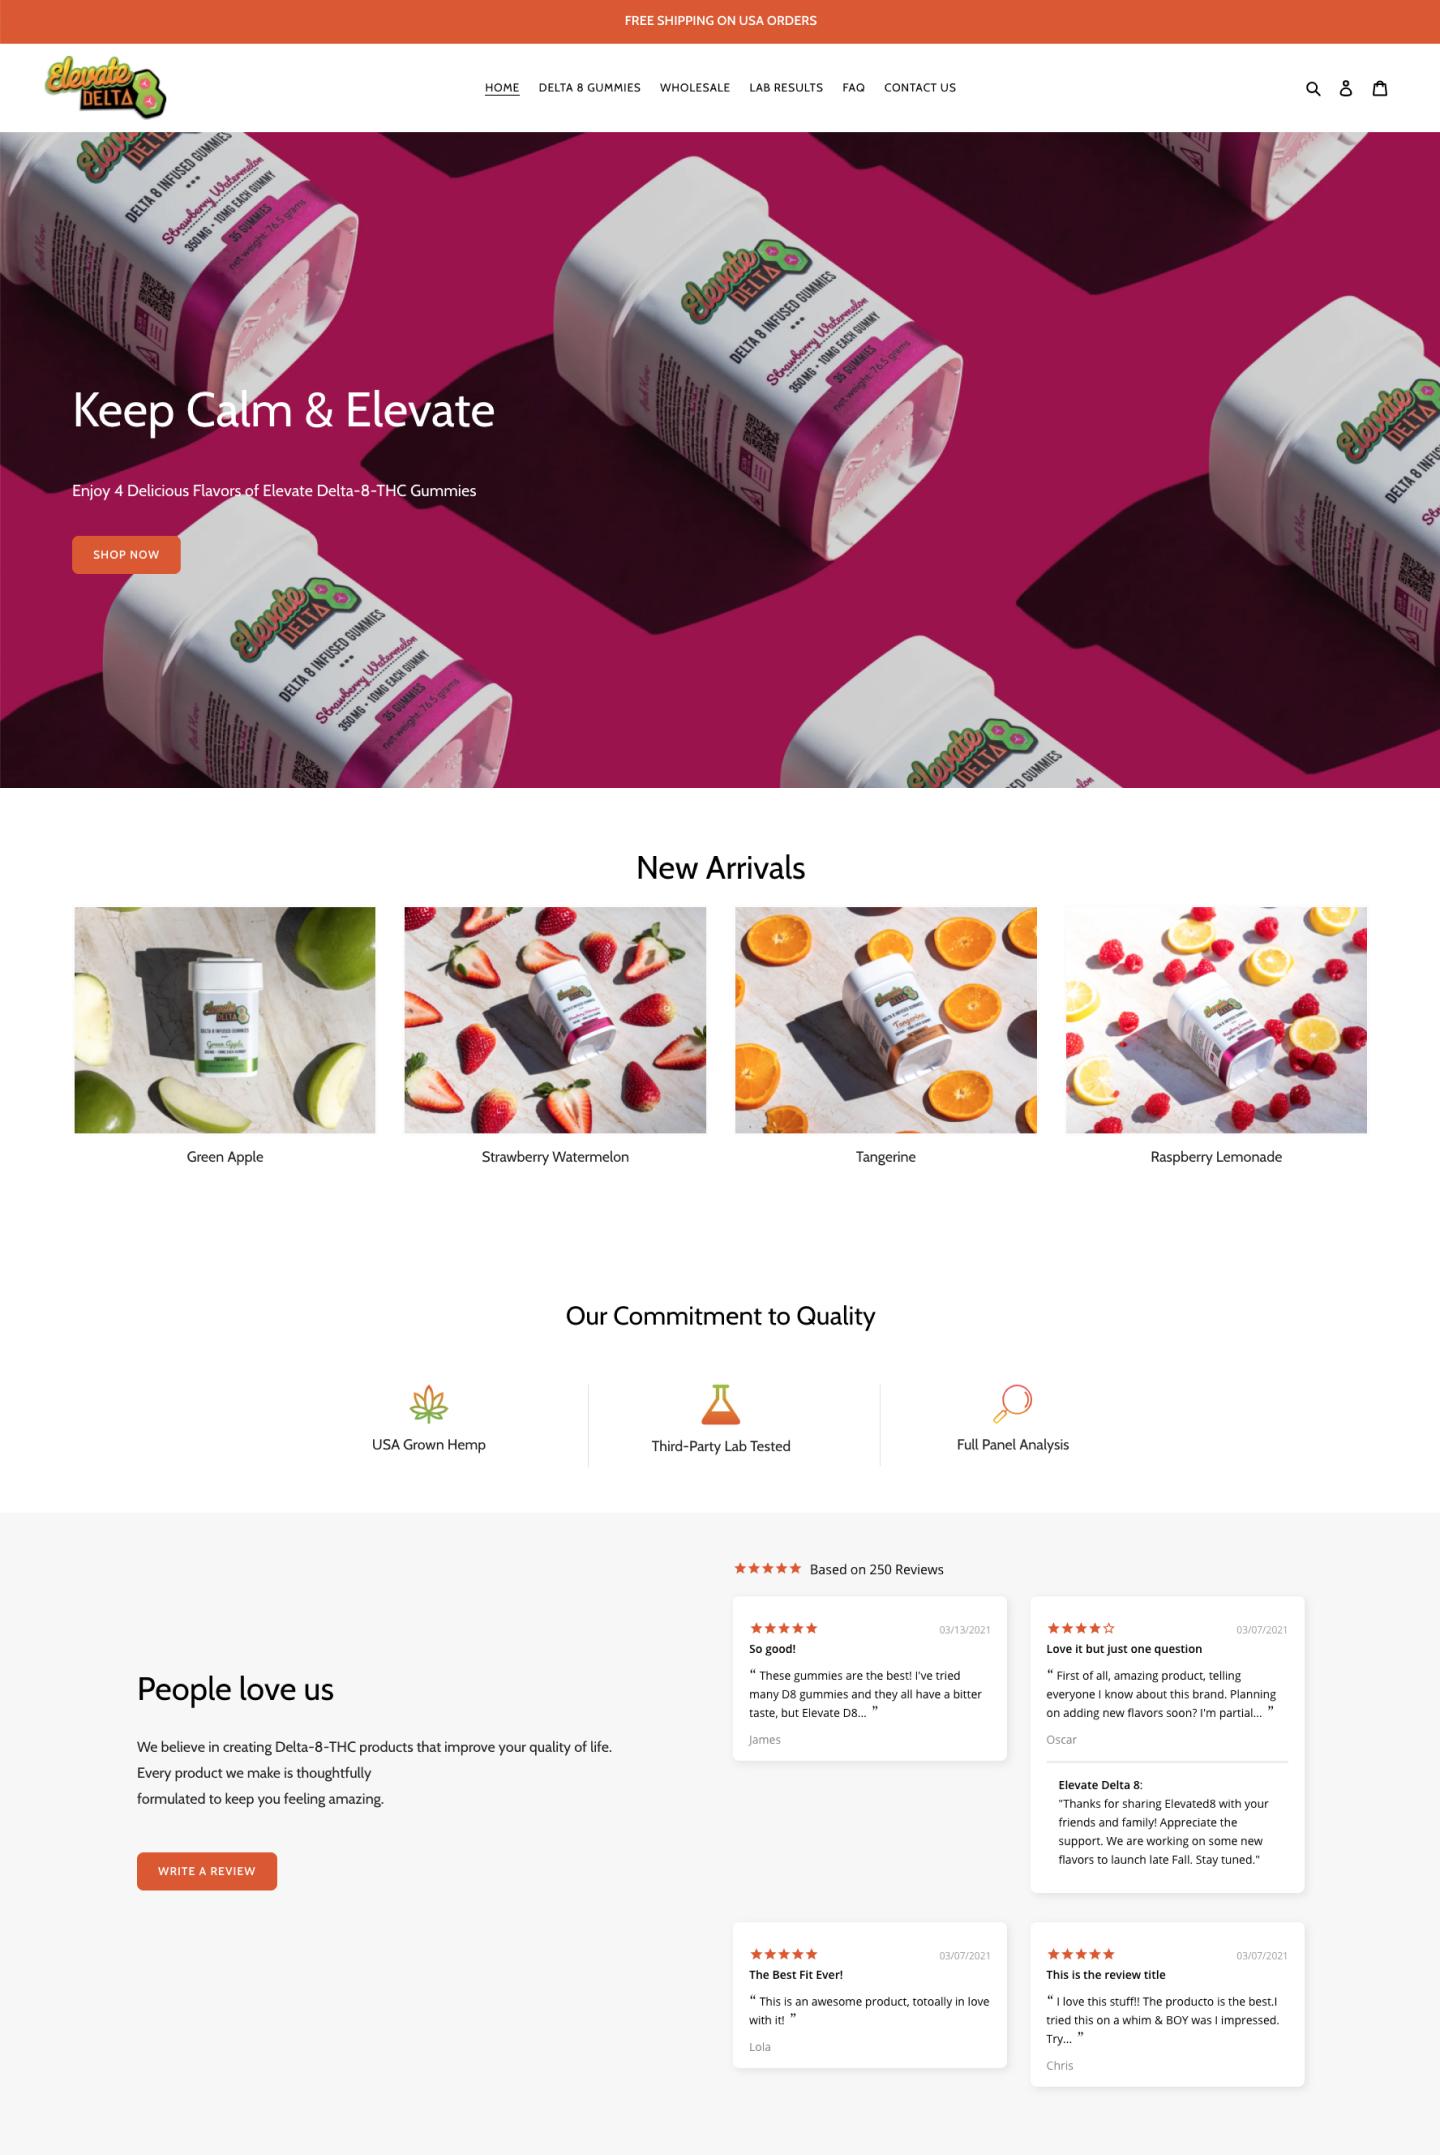 Elevate Delta 8 - CBD Gummies Ecommerce